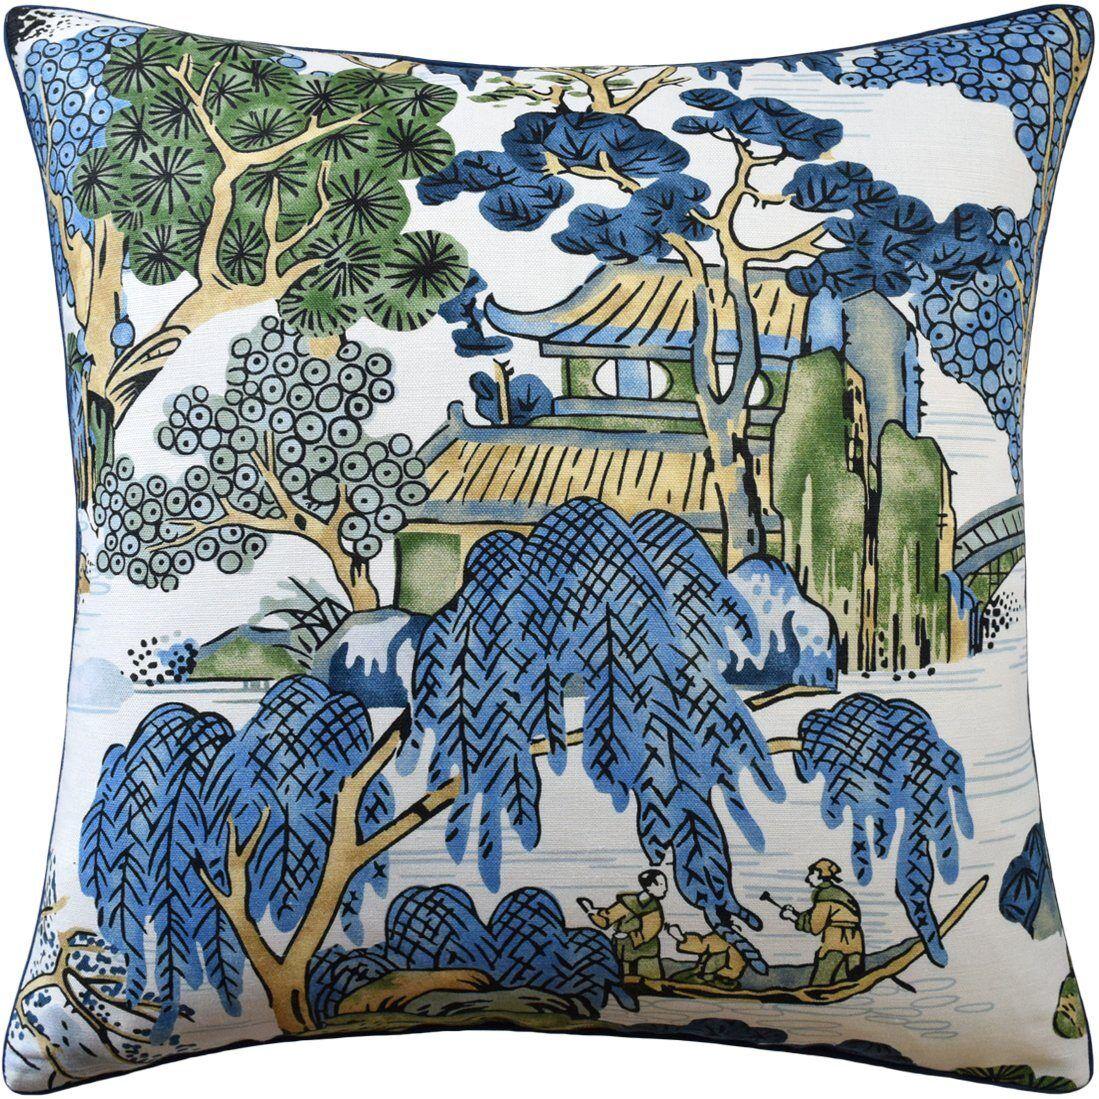 Ryan Studio Asian Scenic Blue and Green Pillow